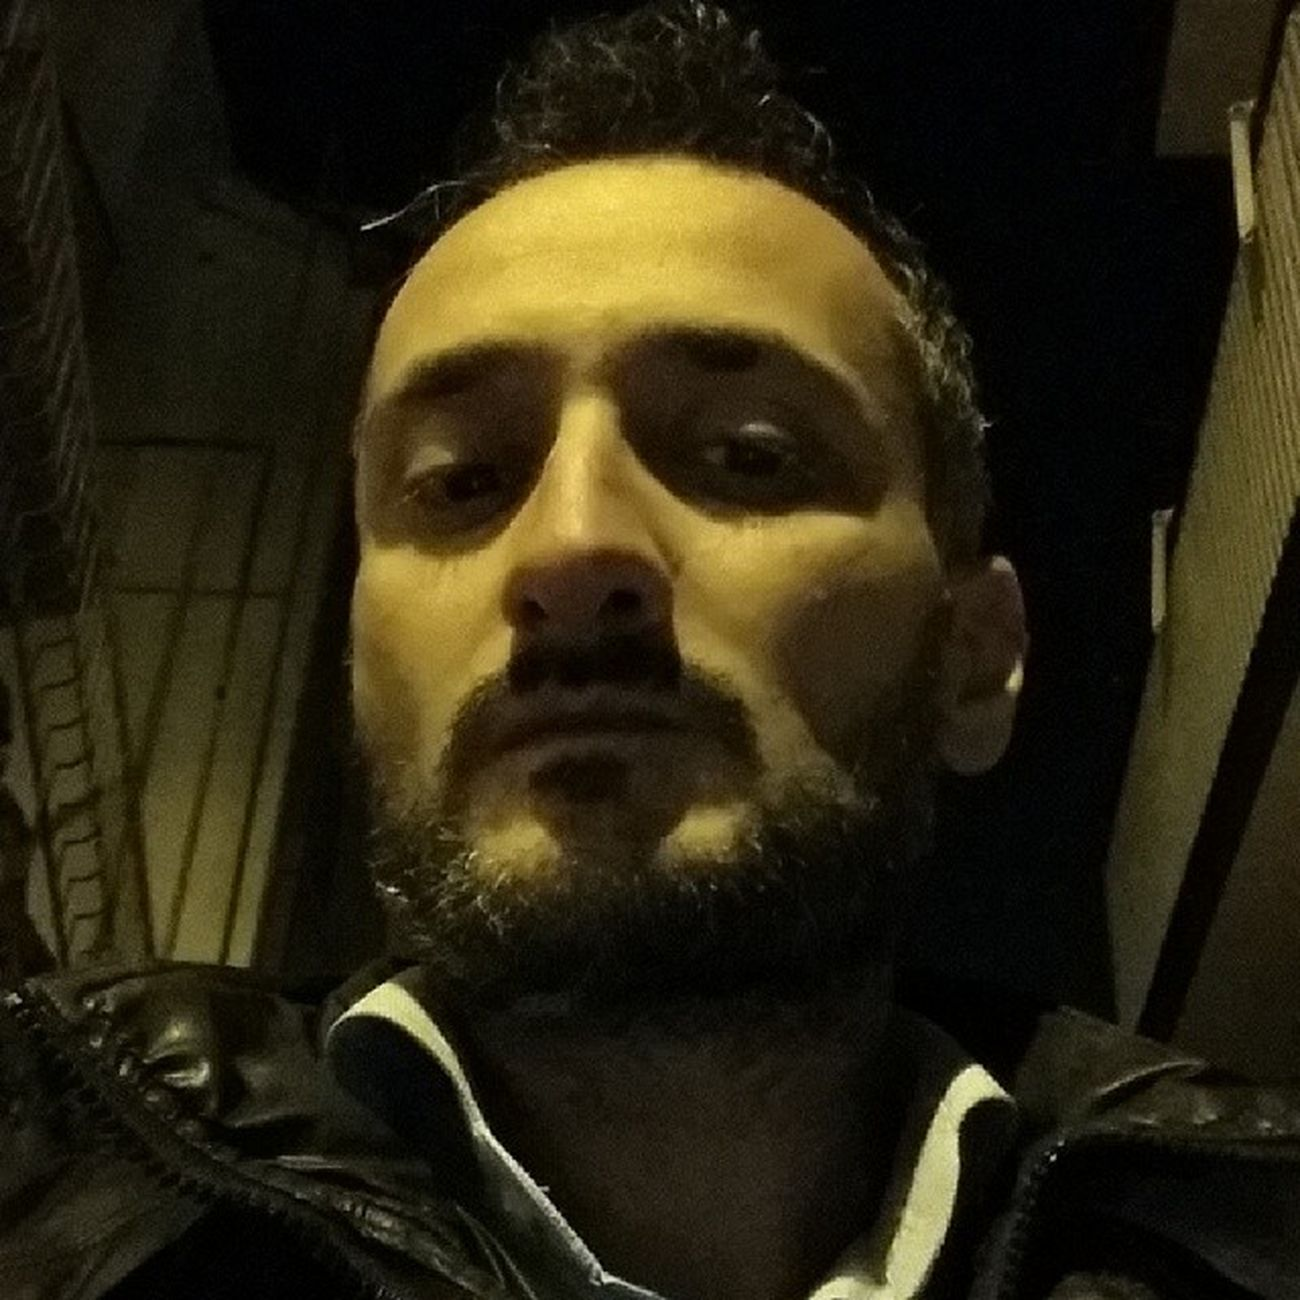 #io #selfie #romantico #sognatore #imbranato #angelo #amore #love #istantanea #instaselfies Love Selfie Amore Io ANGELO Romantico Instaselfies Istantanea Sognatore Imbranato